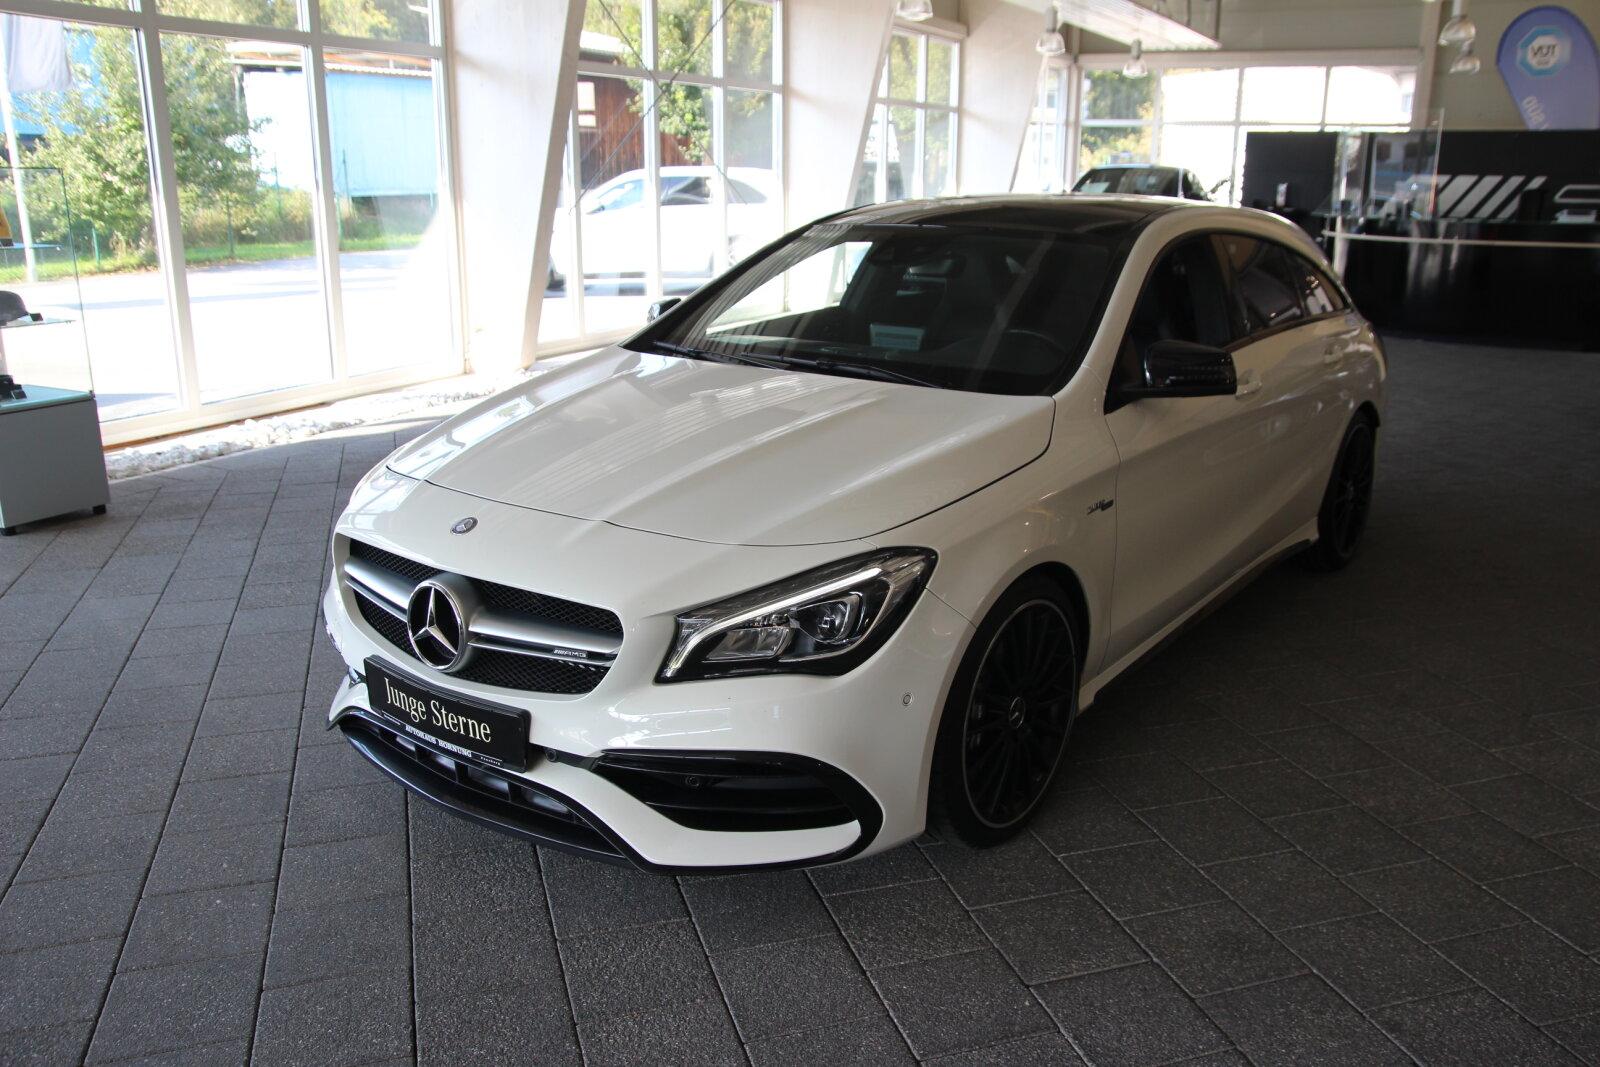 Mercedes-Benz CLA 45 AMG SB/DriverP/Comand/ExclusivP/Klappenau, Jahr 2017, Benzin